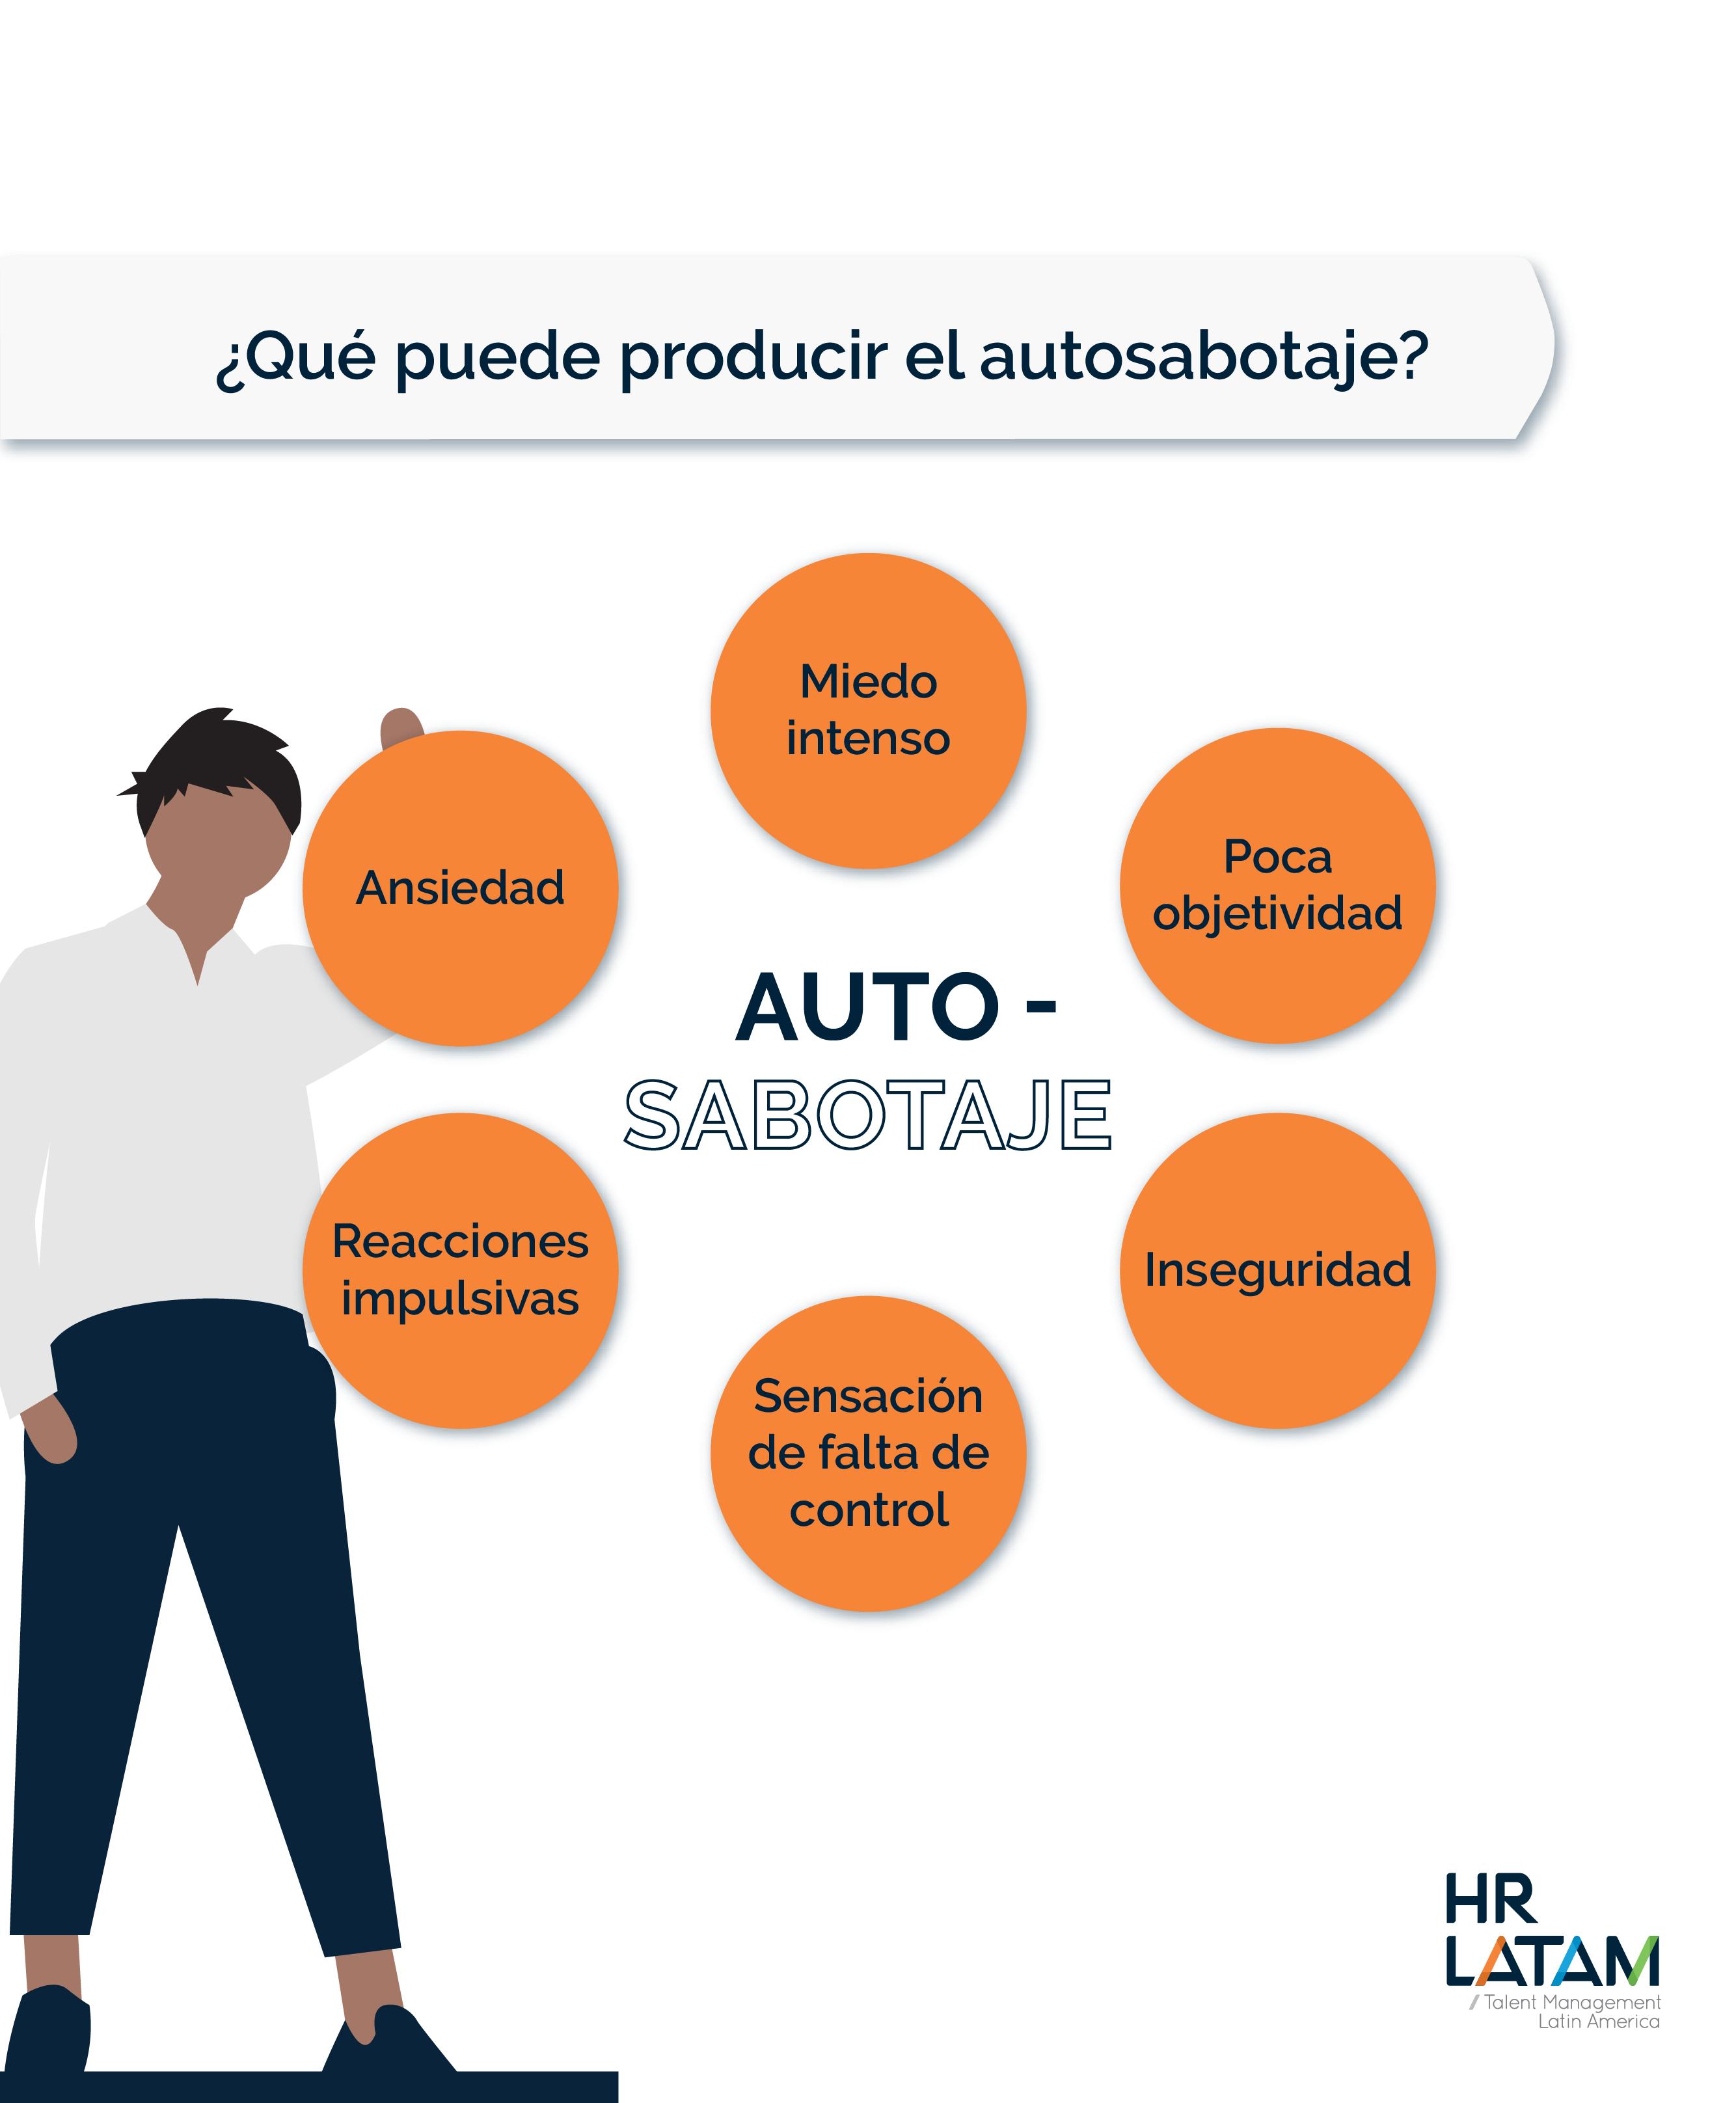 ¿Qué produce el autosabotaje?